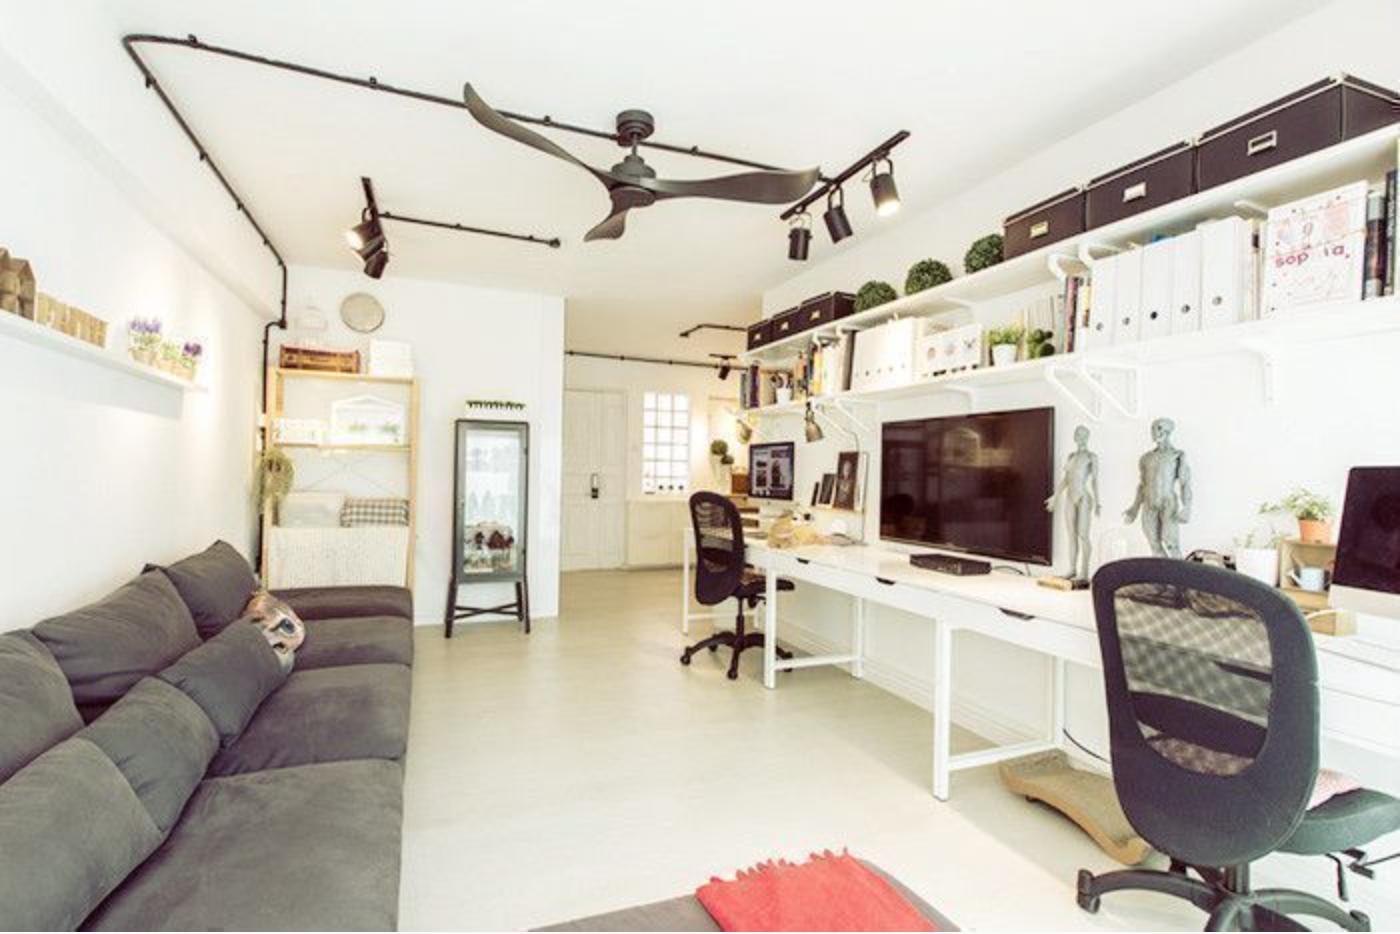 house tour: a creative couple's dreamy ikea-filled flat - 99.co